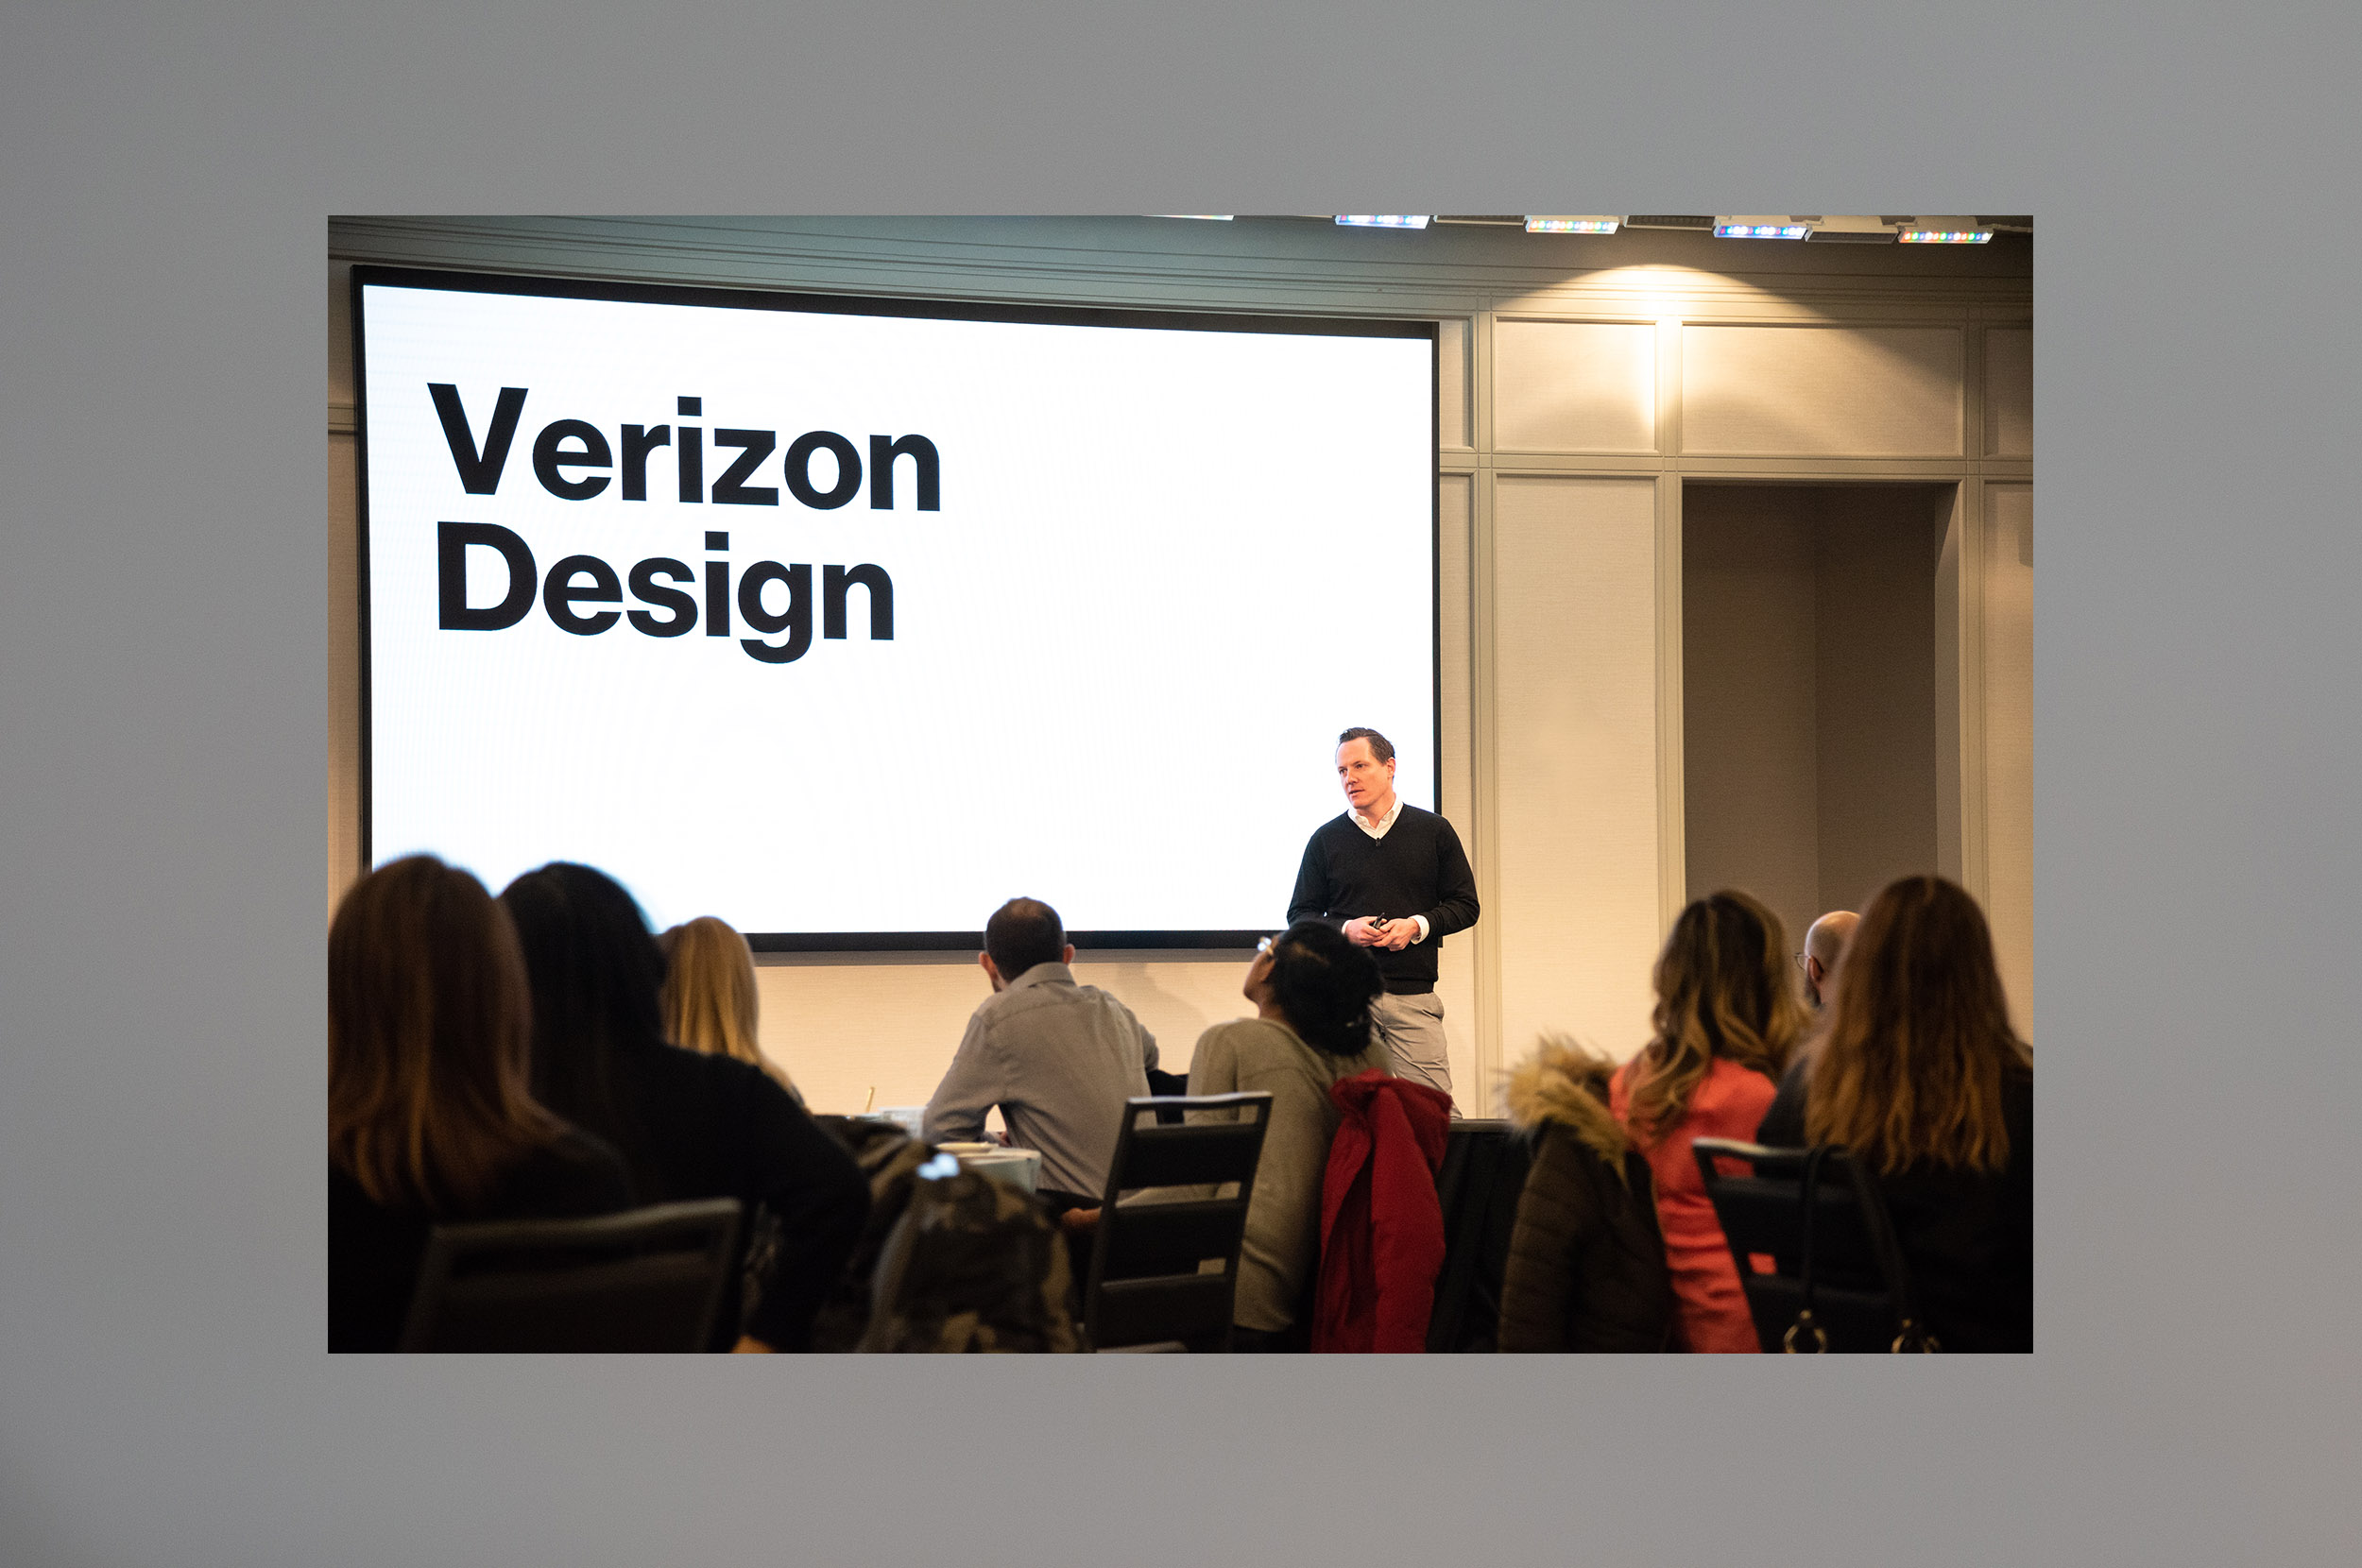 verizon-design-summit-1.jpg